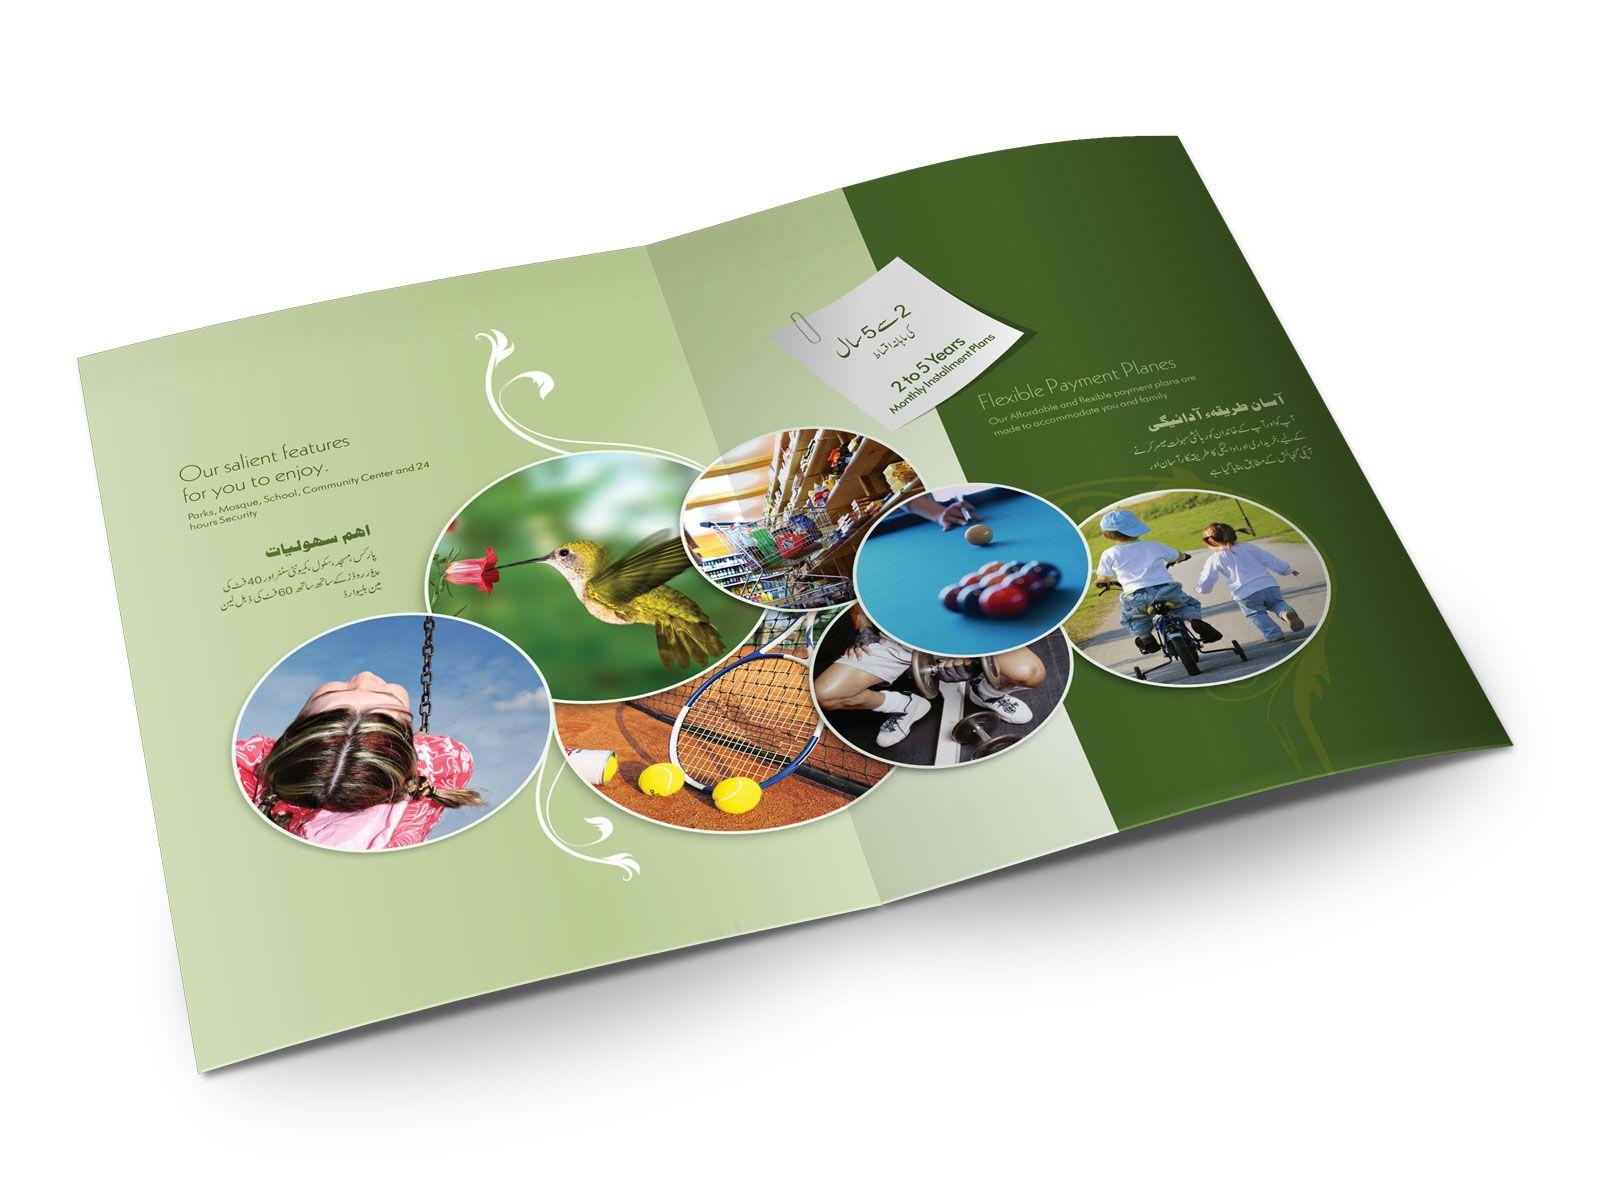 creative brochure design inspiration brochures pinterest brochures brochure design. Black Bedroom Furniture Sets. Home Design Ideas